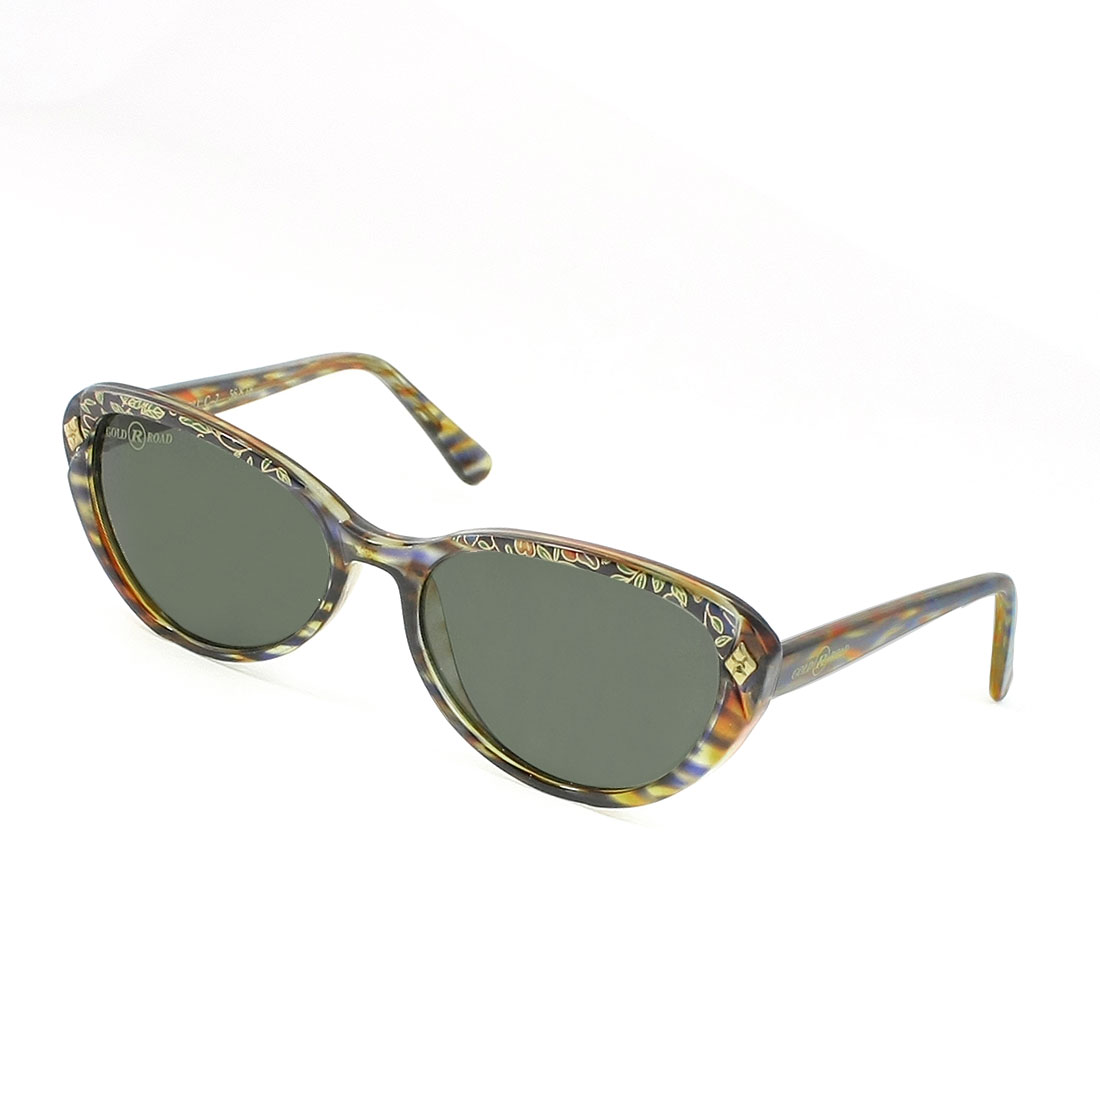 Ladies Clear Black Lens Plastic Floral Pattern Full Frame Sunglasses Eyeglasses